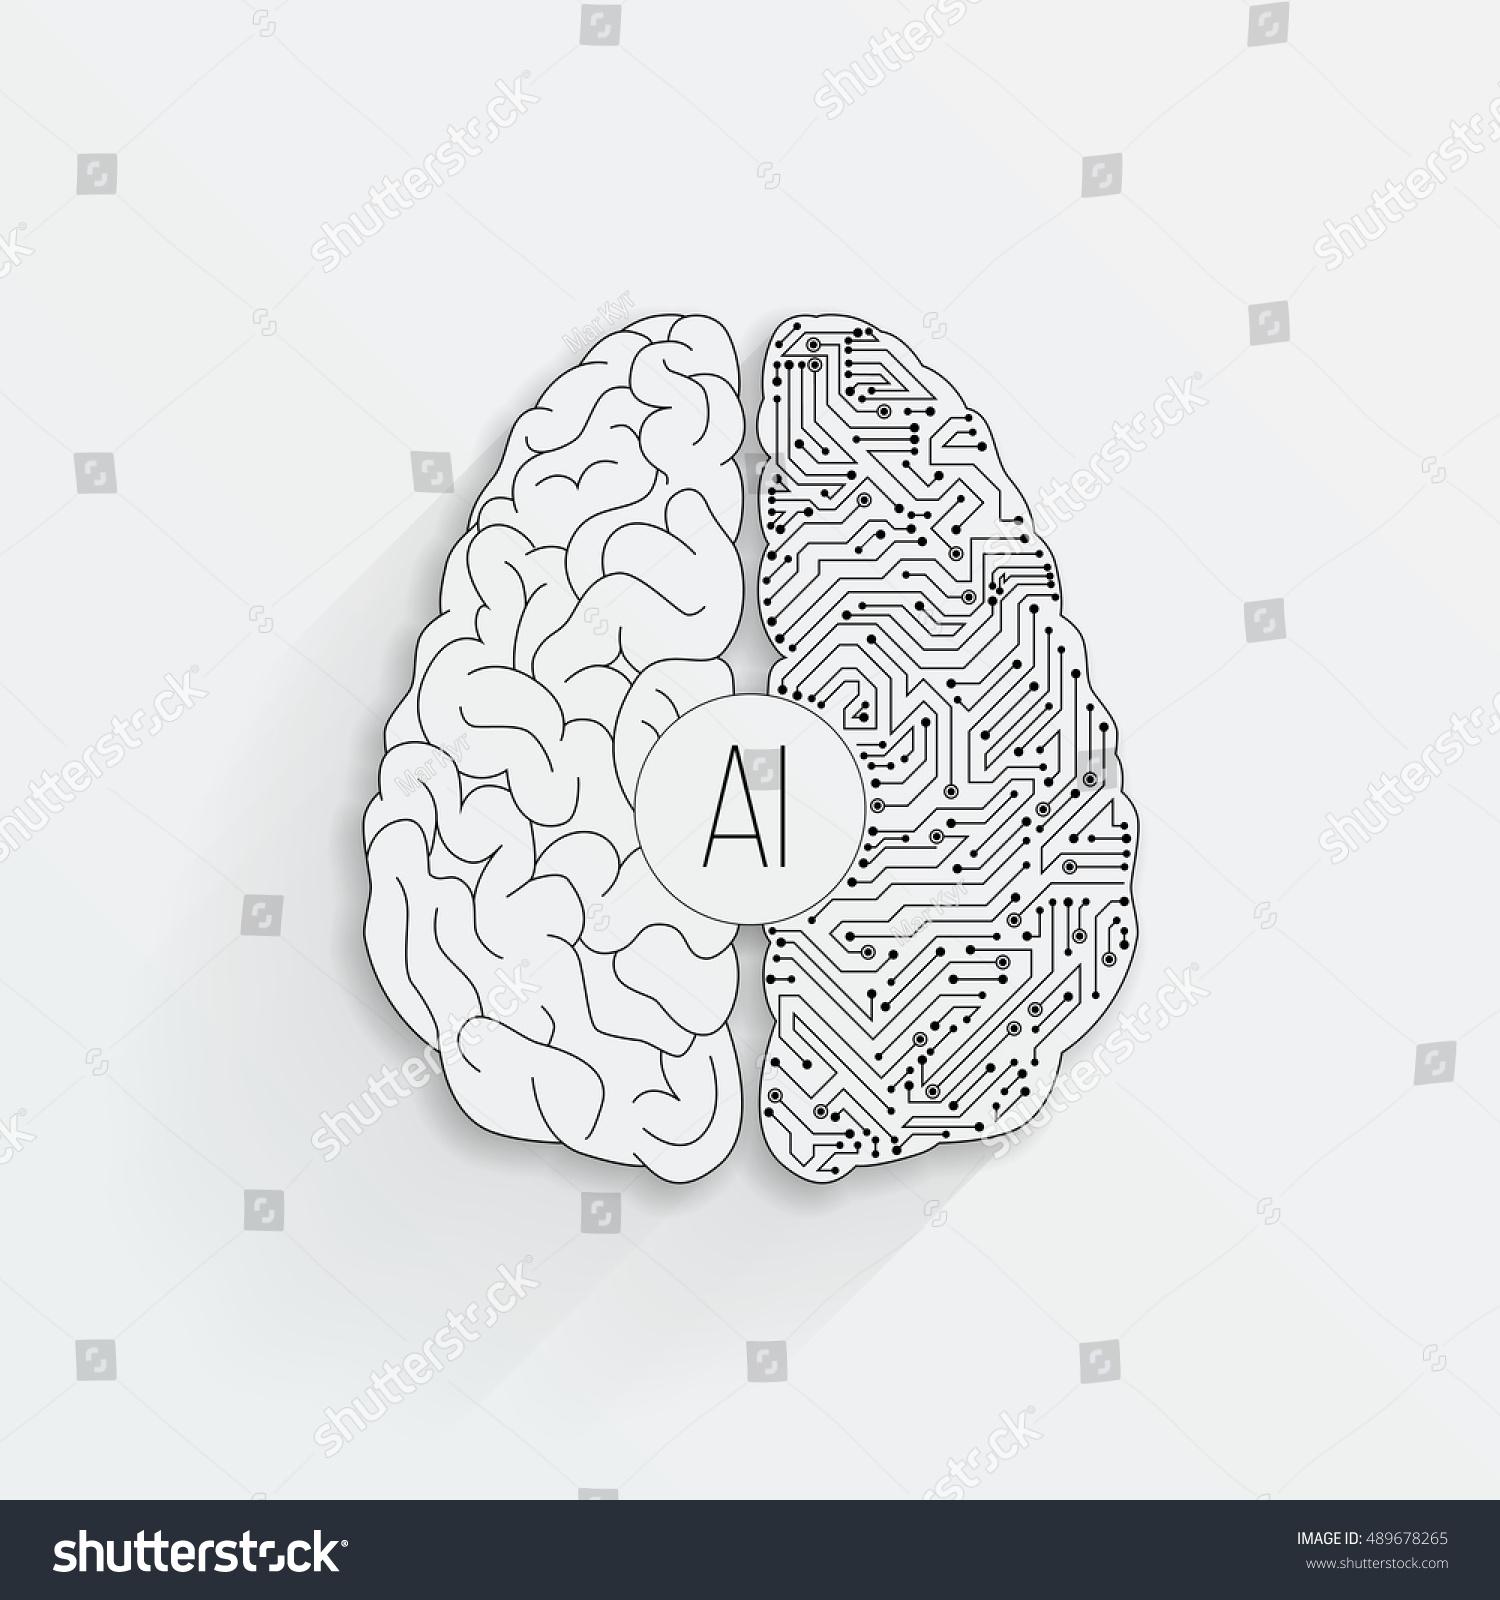 brain top view vector - photo #18